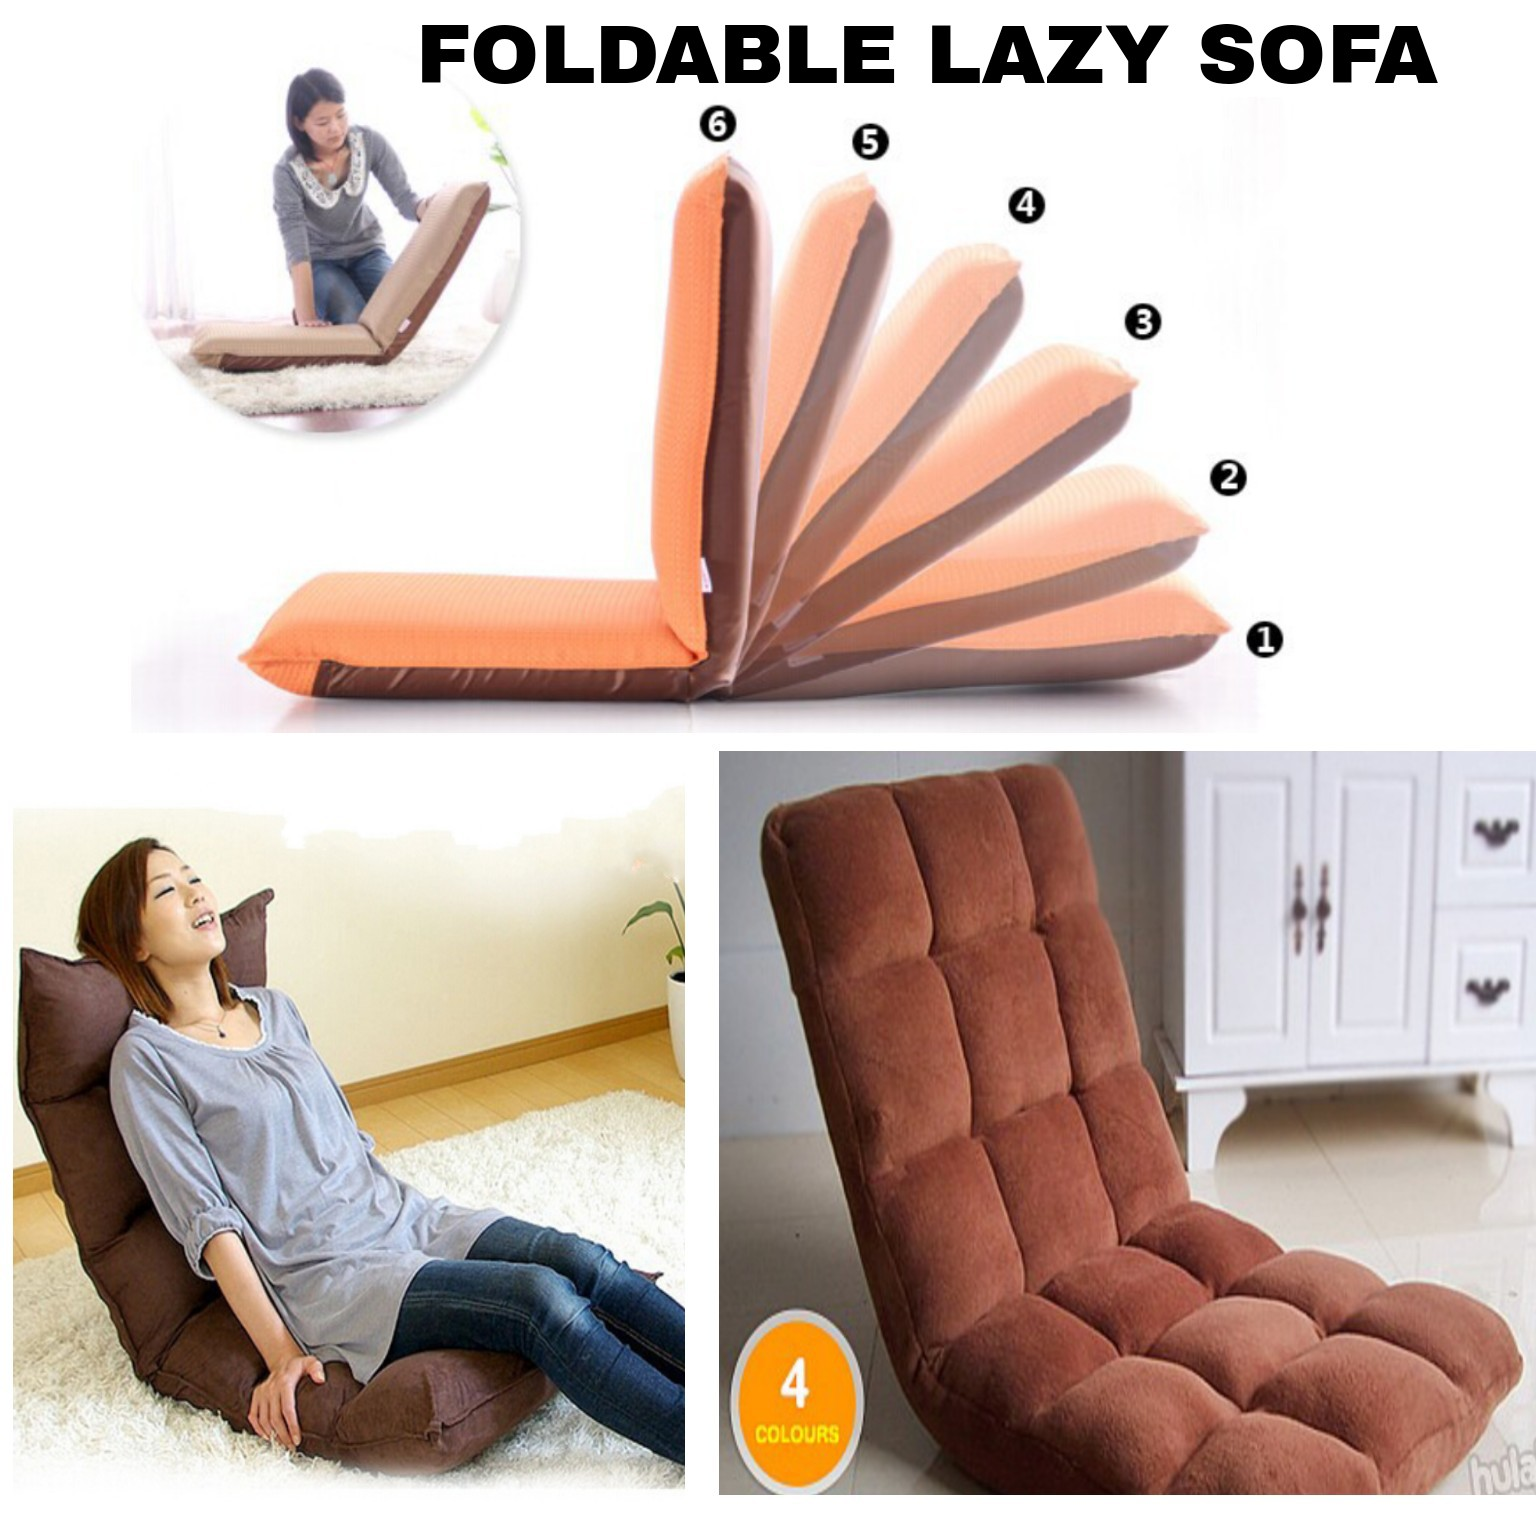 MALAYSIA SAVE SHOP JUAL BORONG MURAH MALAYSIA Foldable Lazy